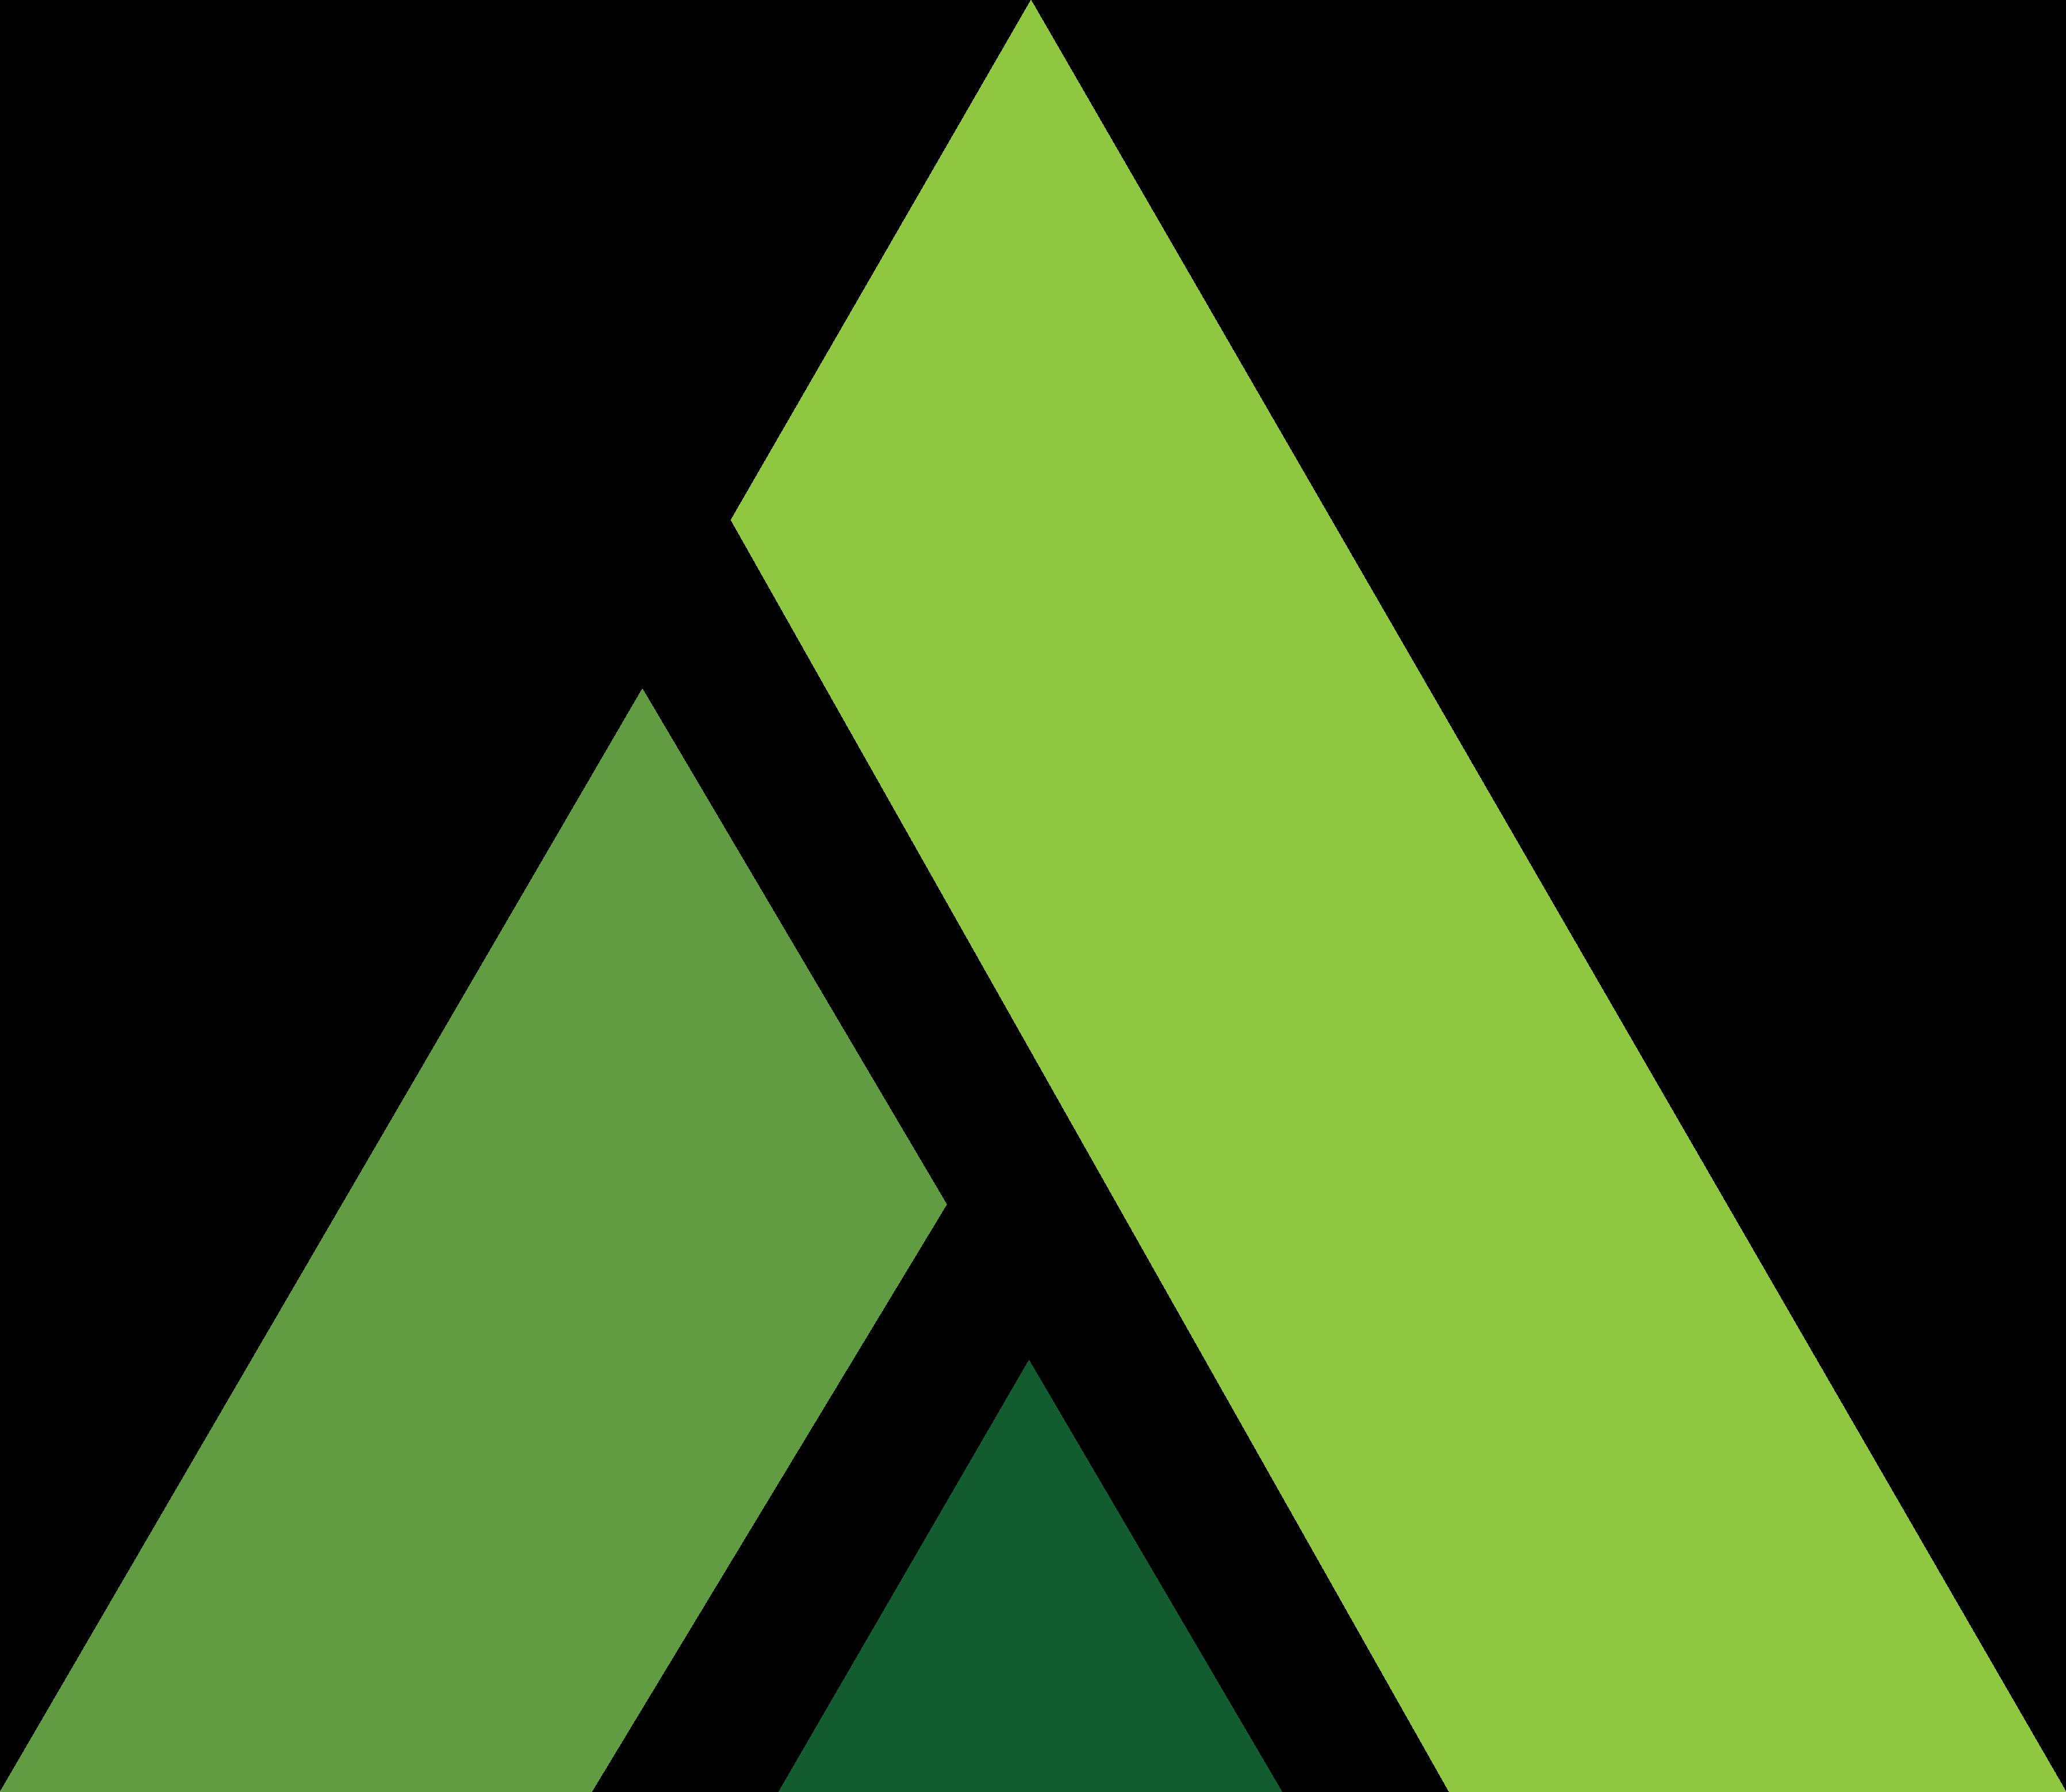 aspen_logo_triangle_bck_green